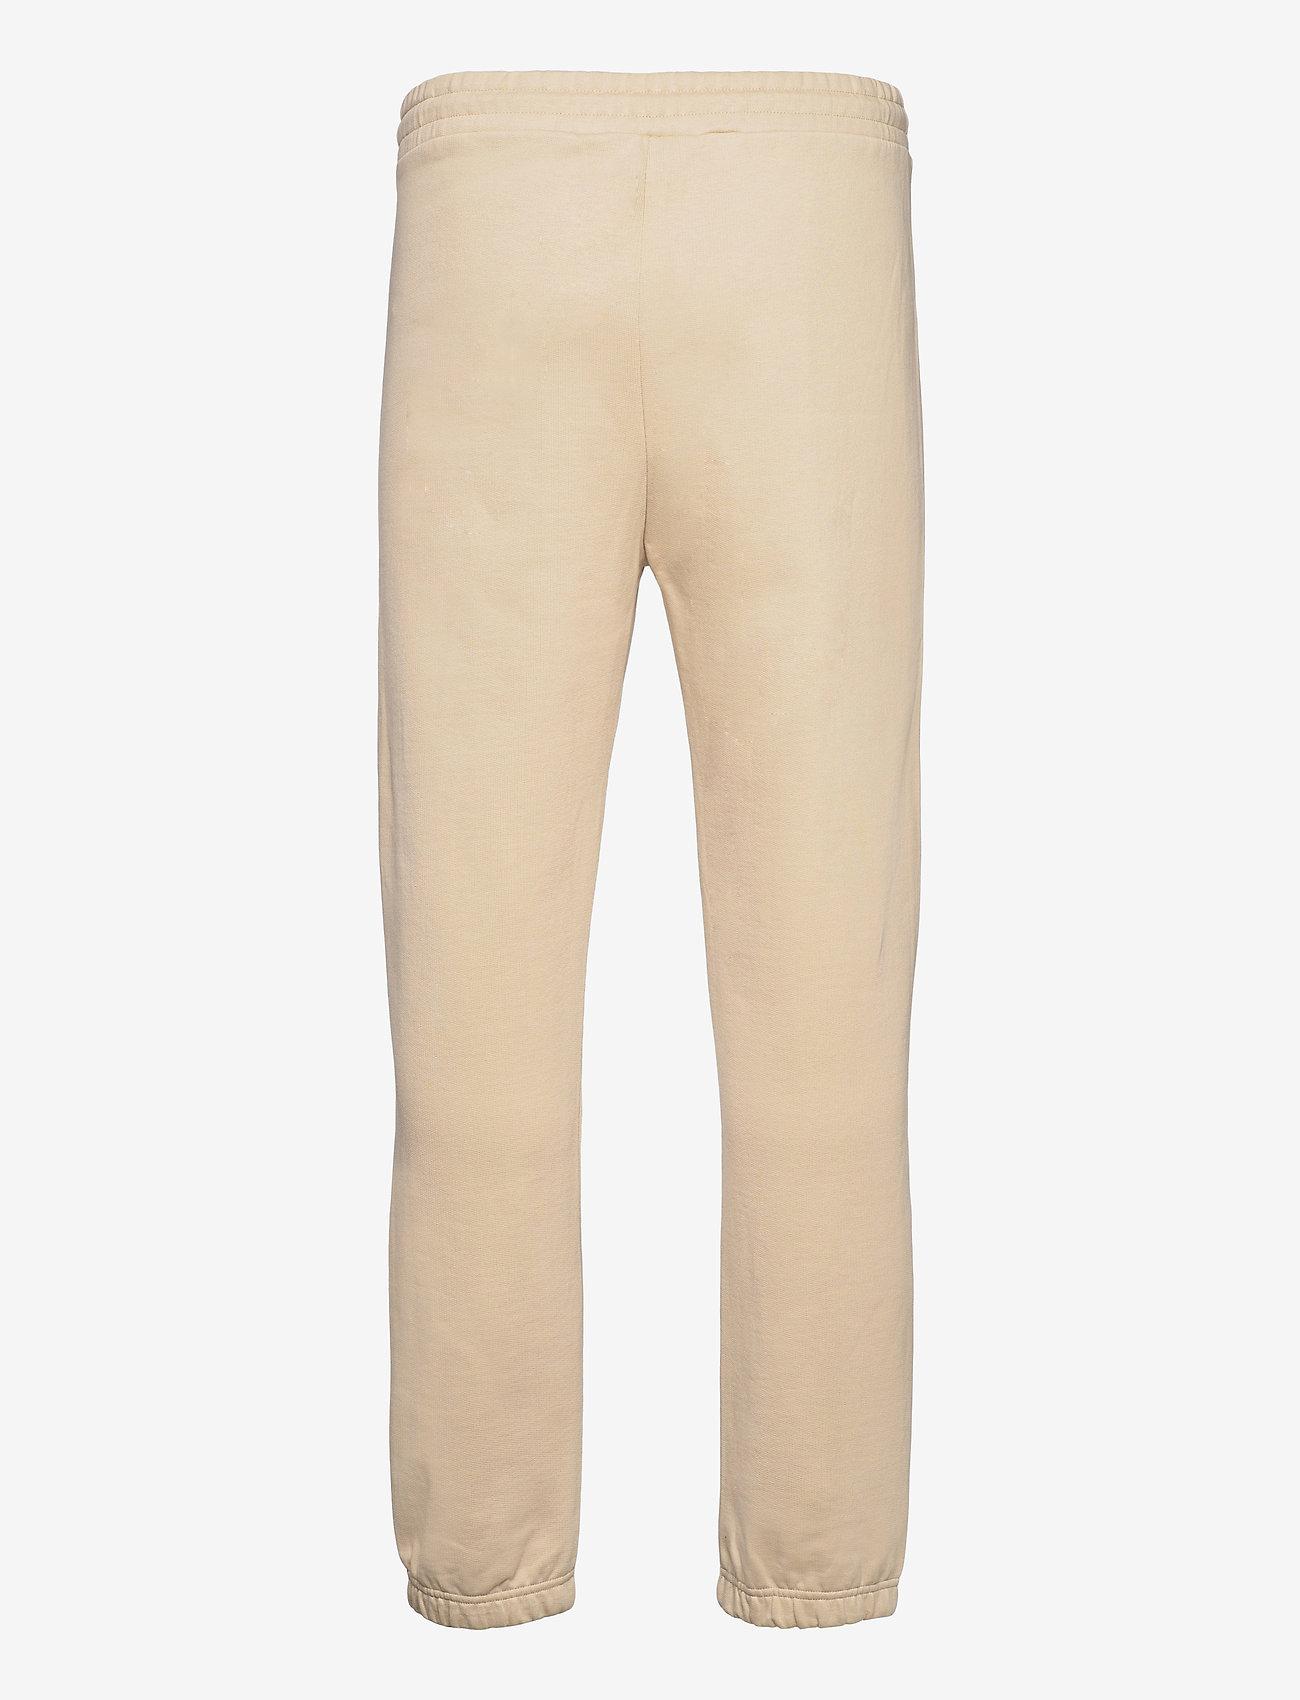 HAN Kjøbenhavn - Sweatpants - kleding - sand - 1